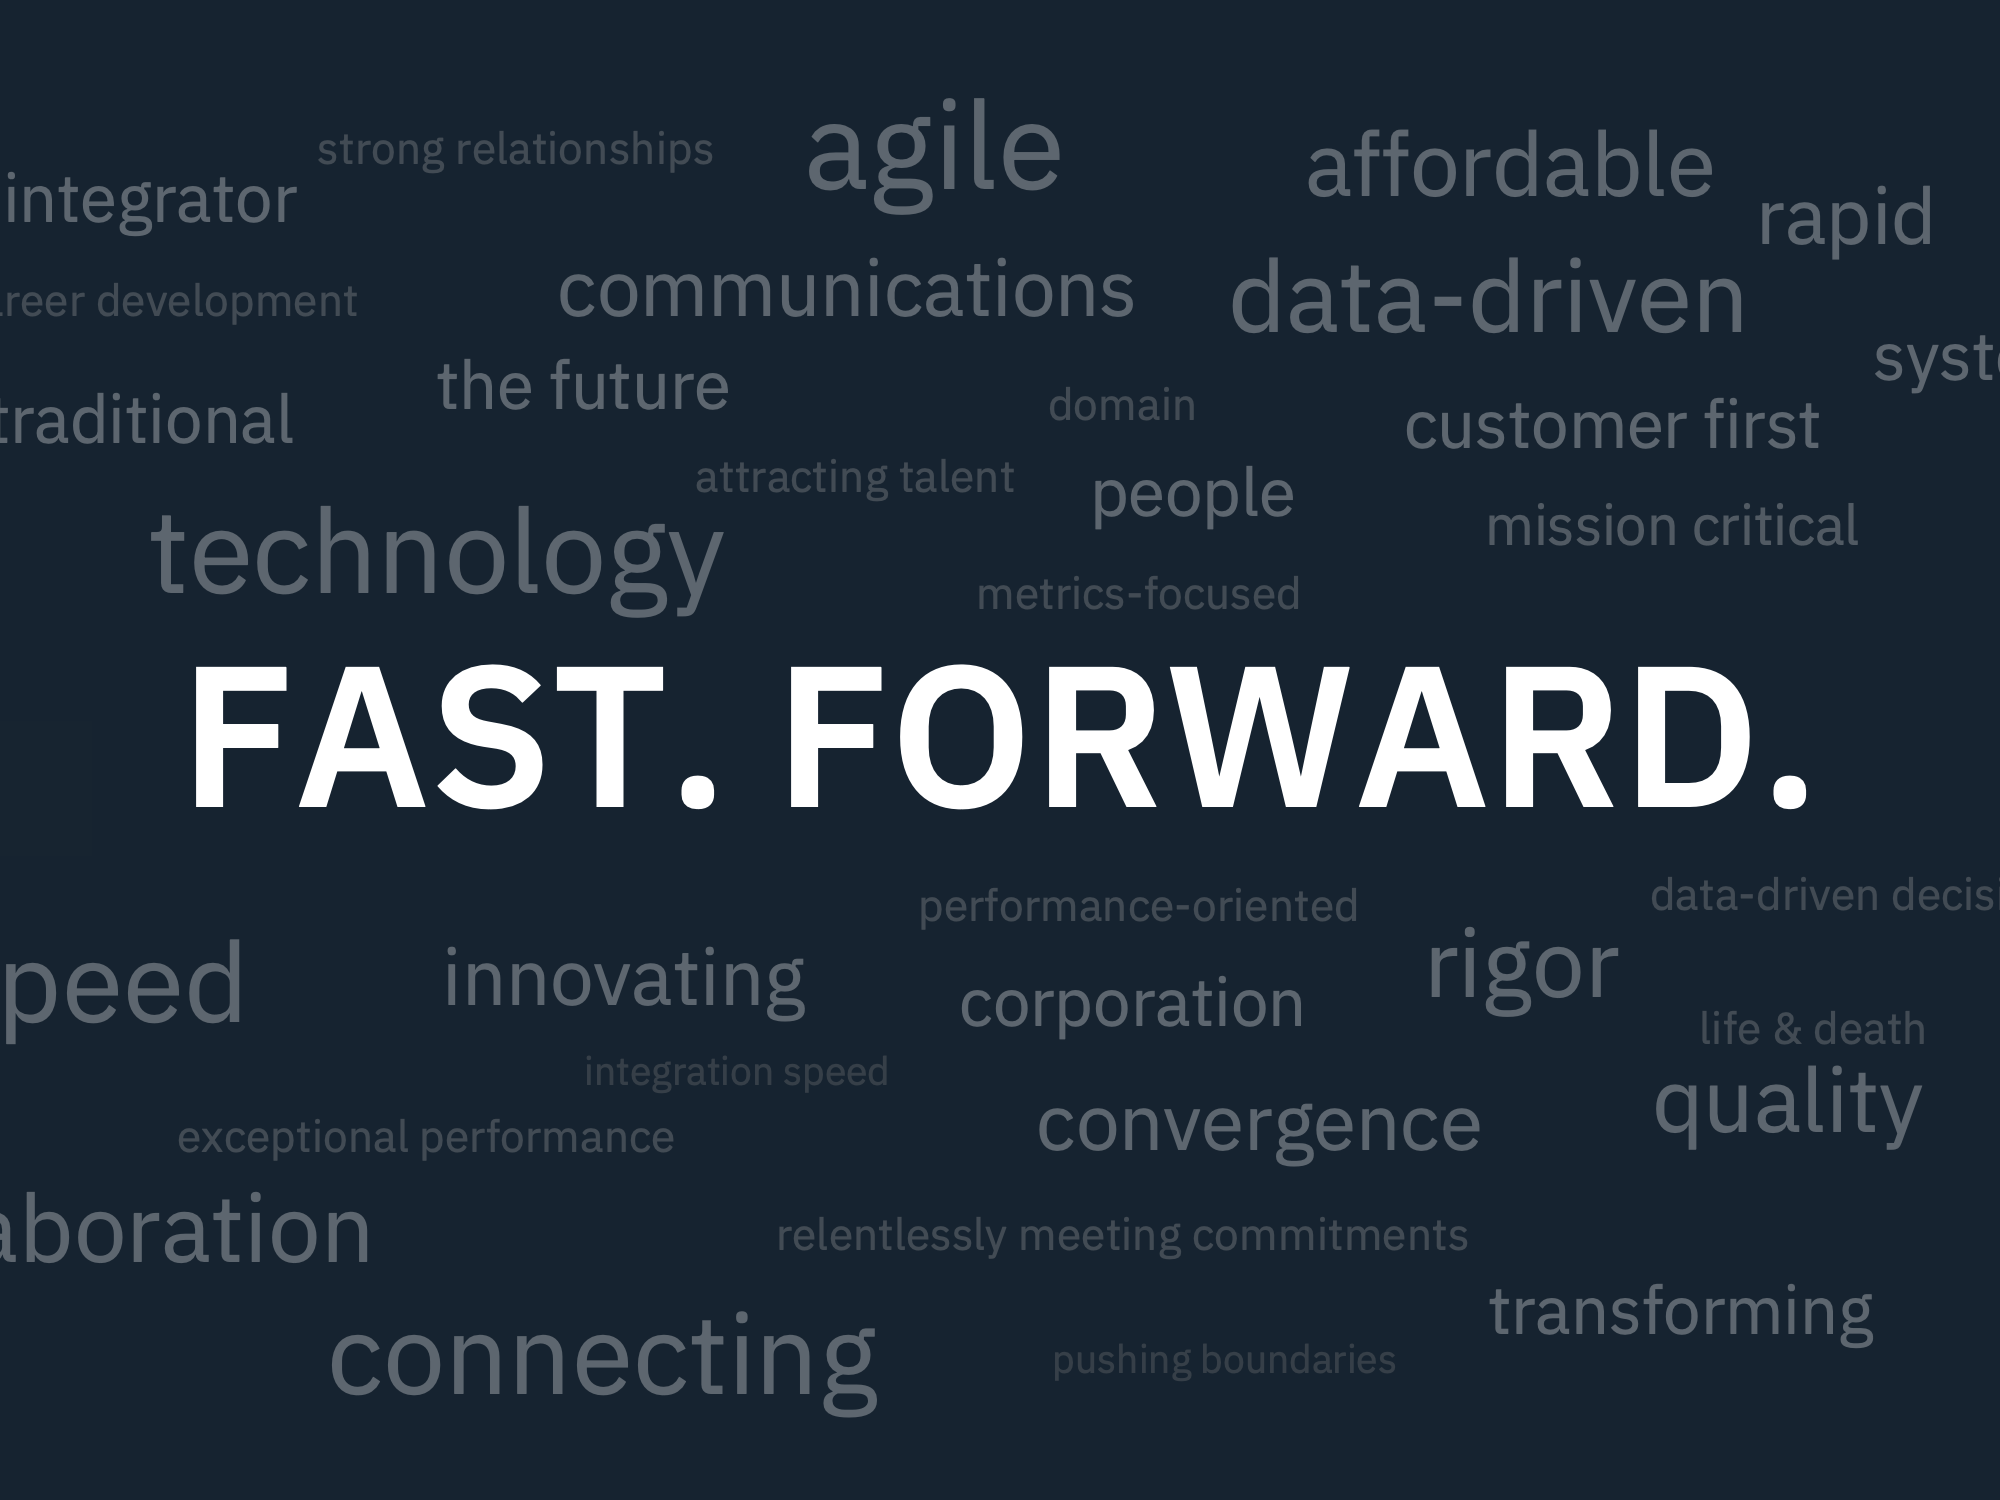 Word cloud that led to the L3Harris tagline, 'Fast. Forward.'